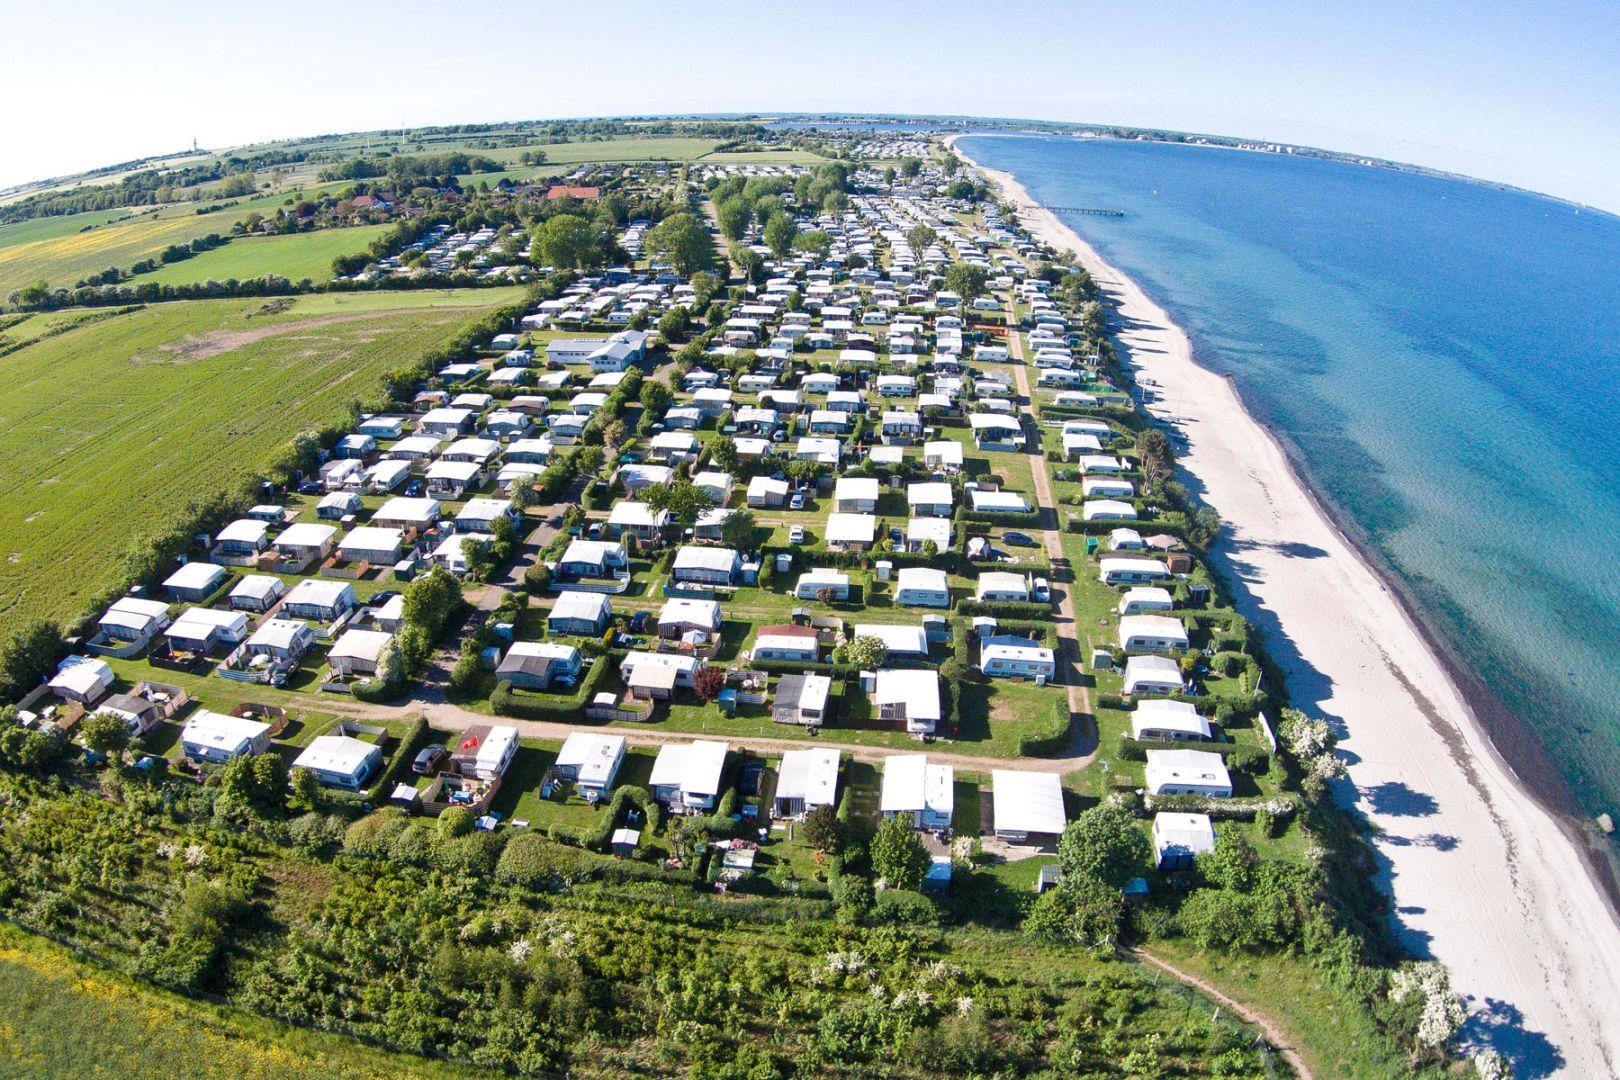 Urlaub Camping Mobilheim Ostsee Camping Hohes Ufer